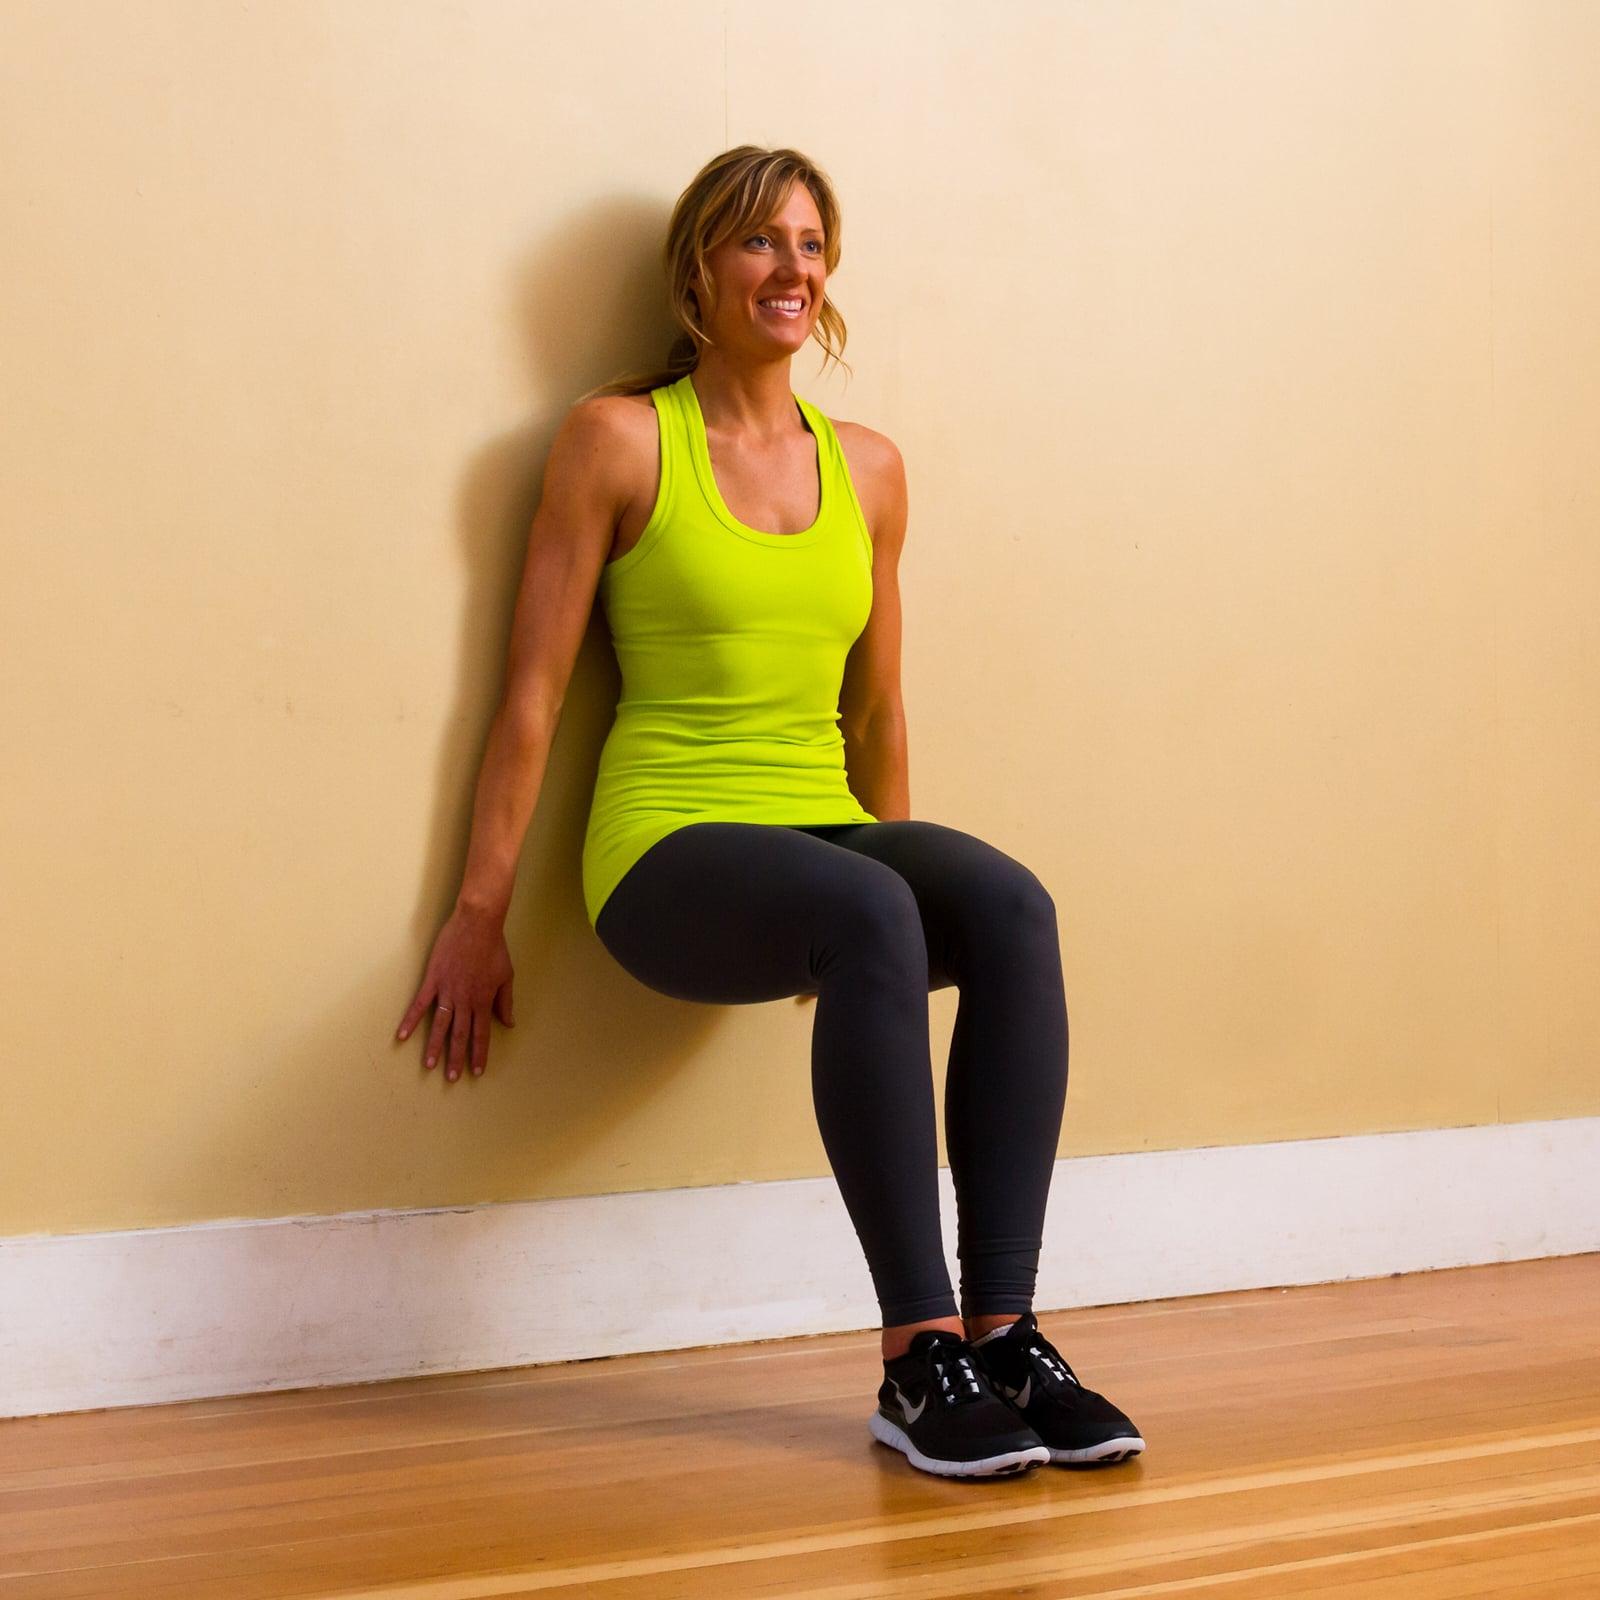 Move 4: Wall Sit